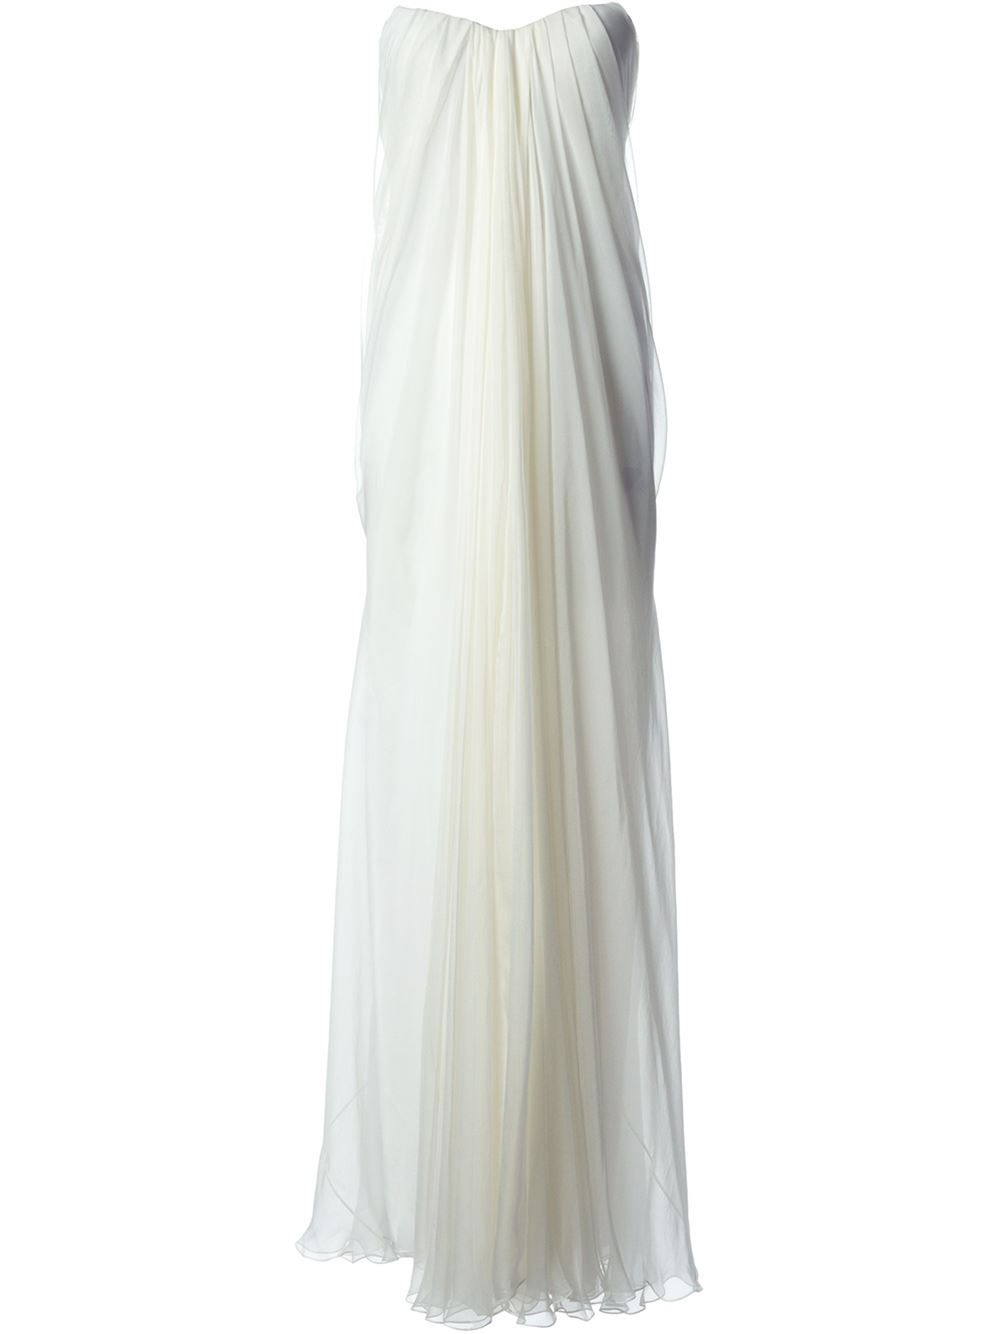 Alexander Mcqueen Draped Bustier Gown - Gente Roma - Farfetch.com